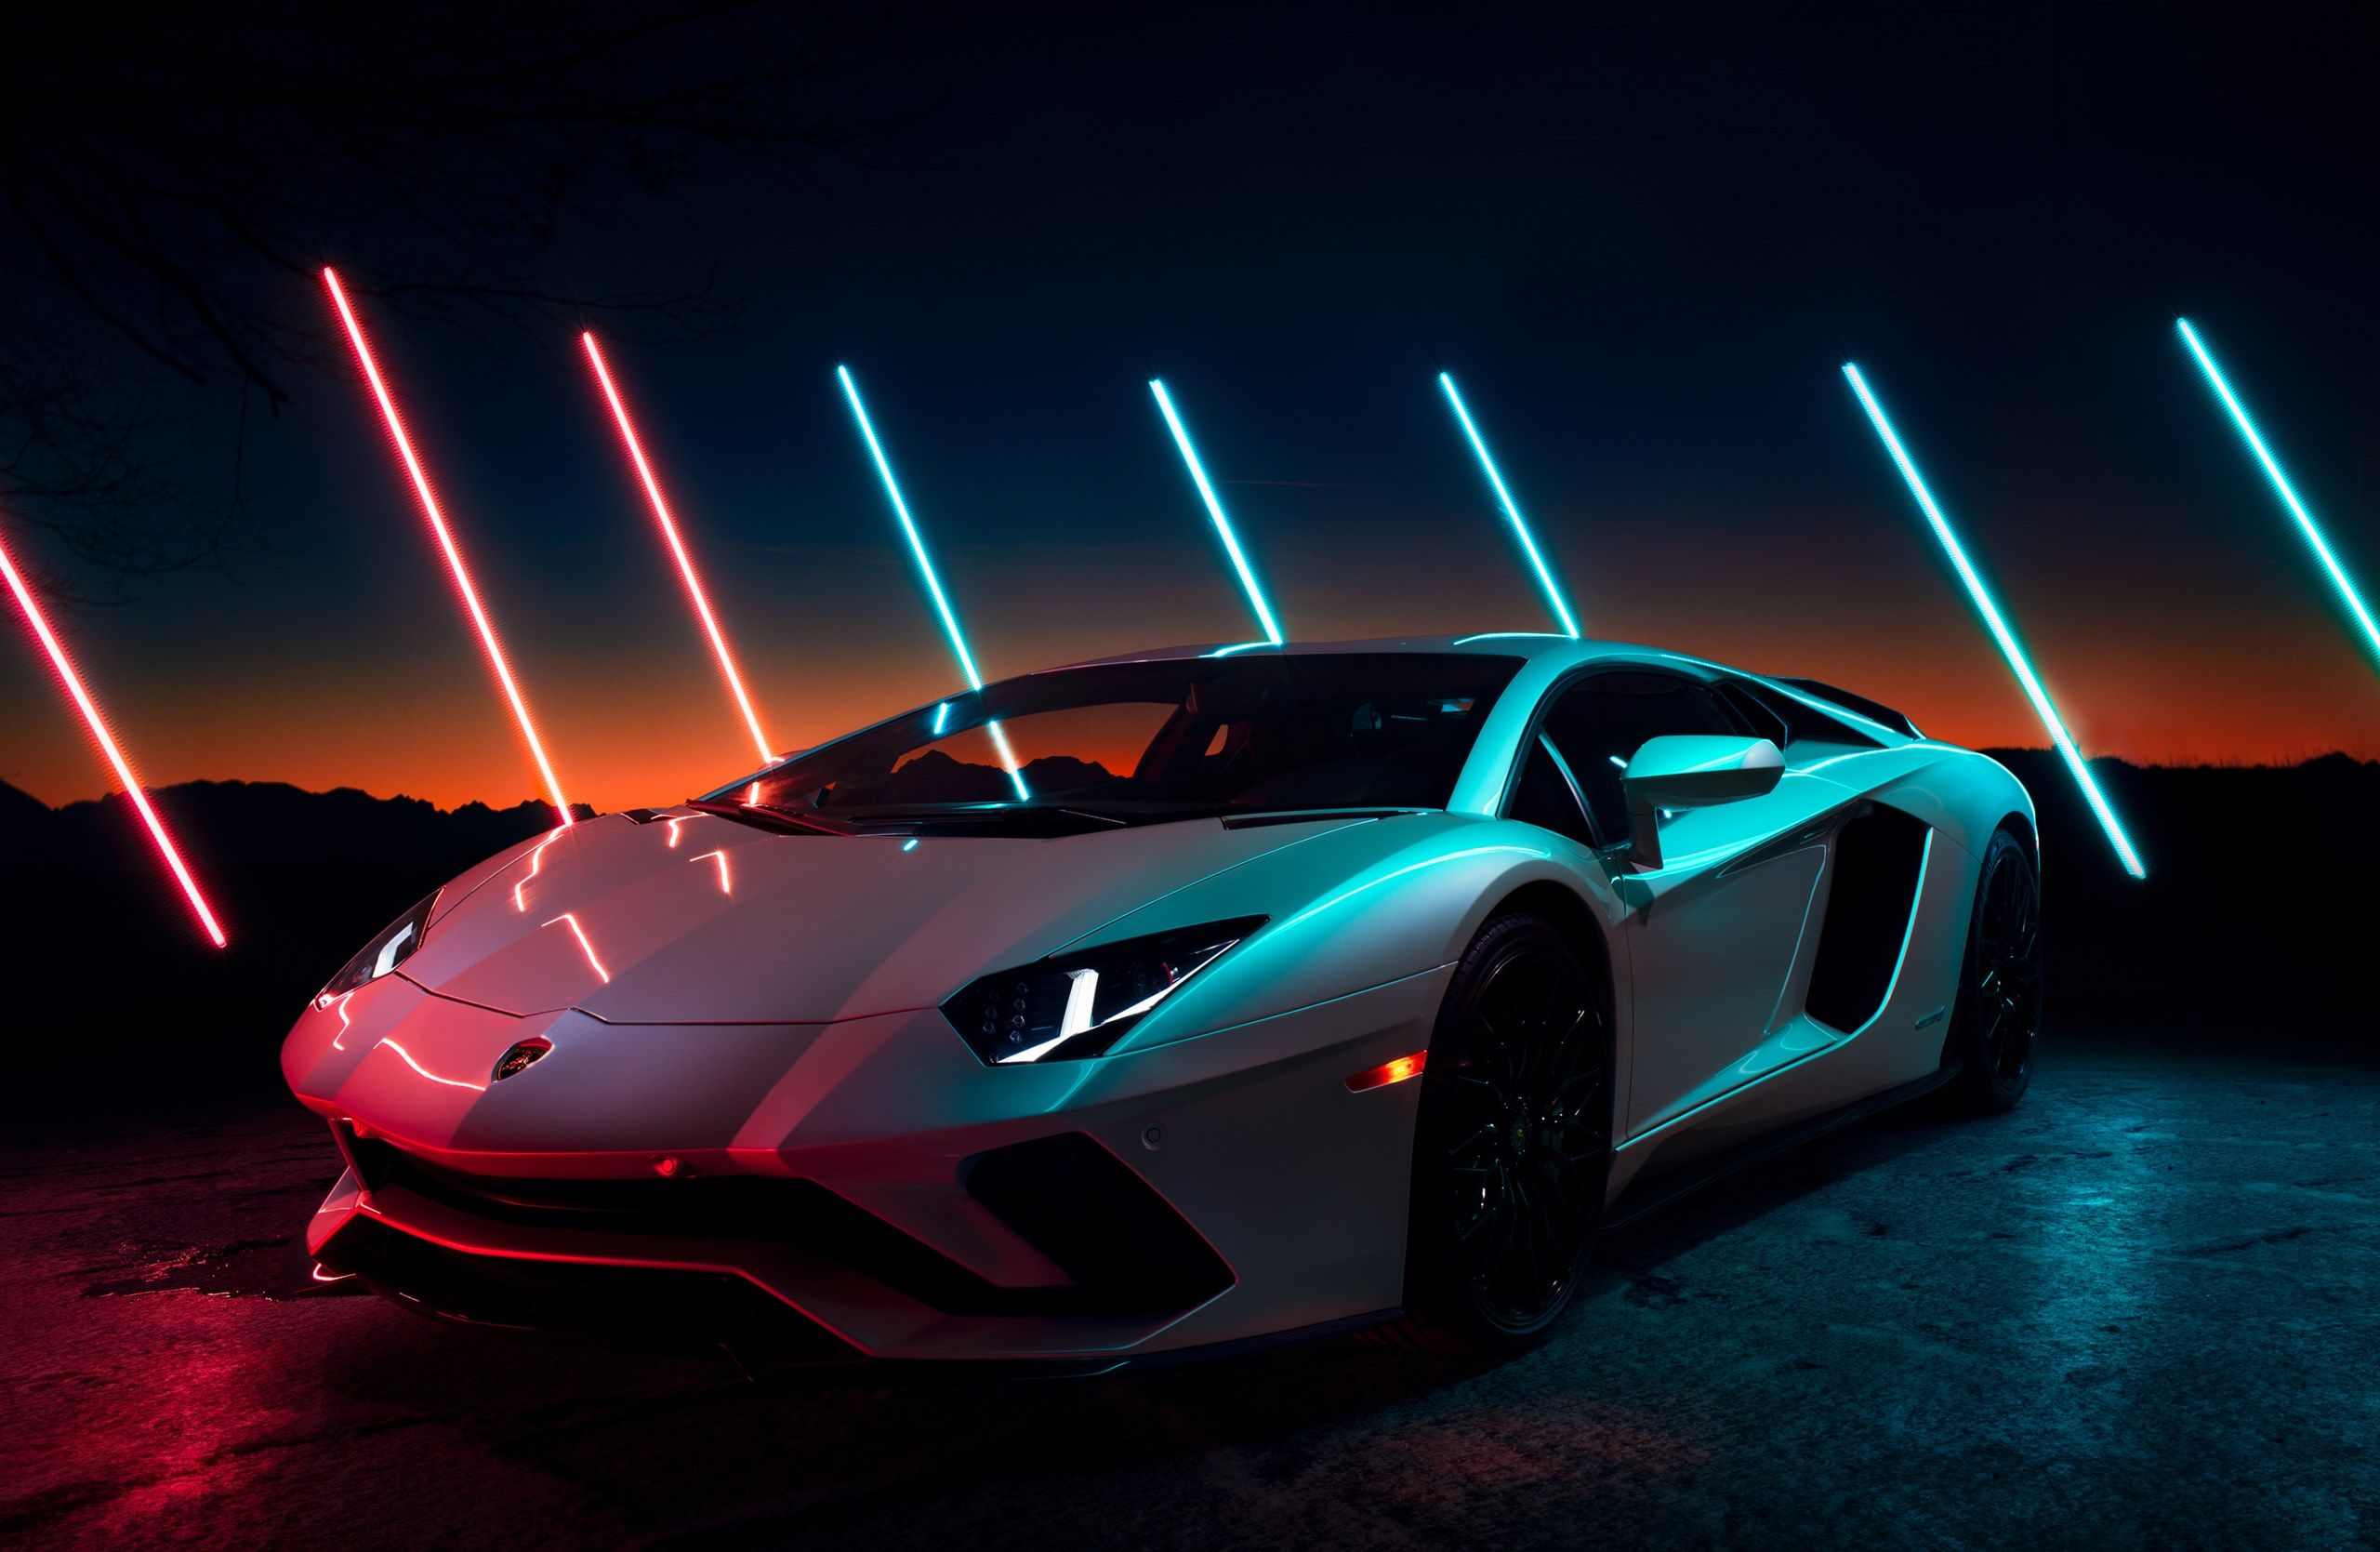 Lamborghini Aventador S Tillman Light Drawing Luxury Cars Lamborghini Aventador Wallpaper Neon Car